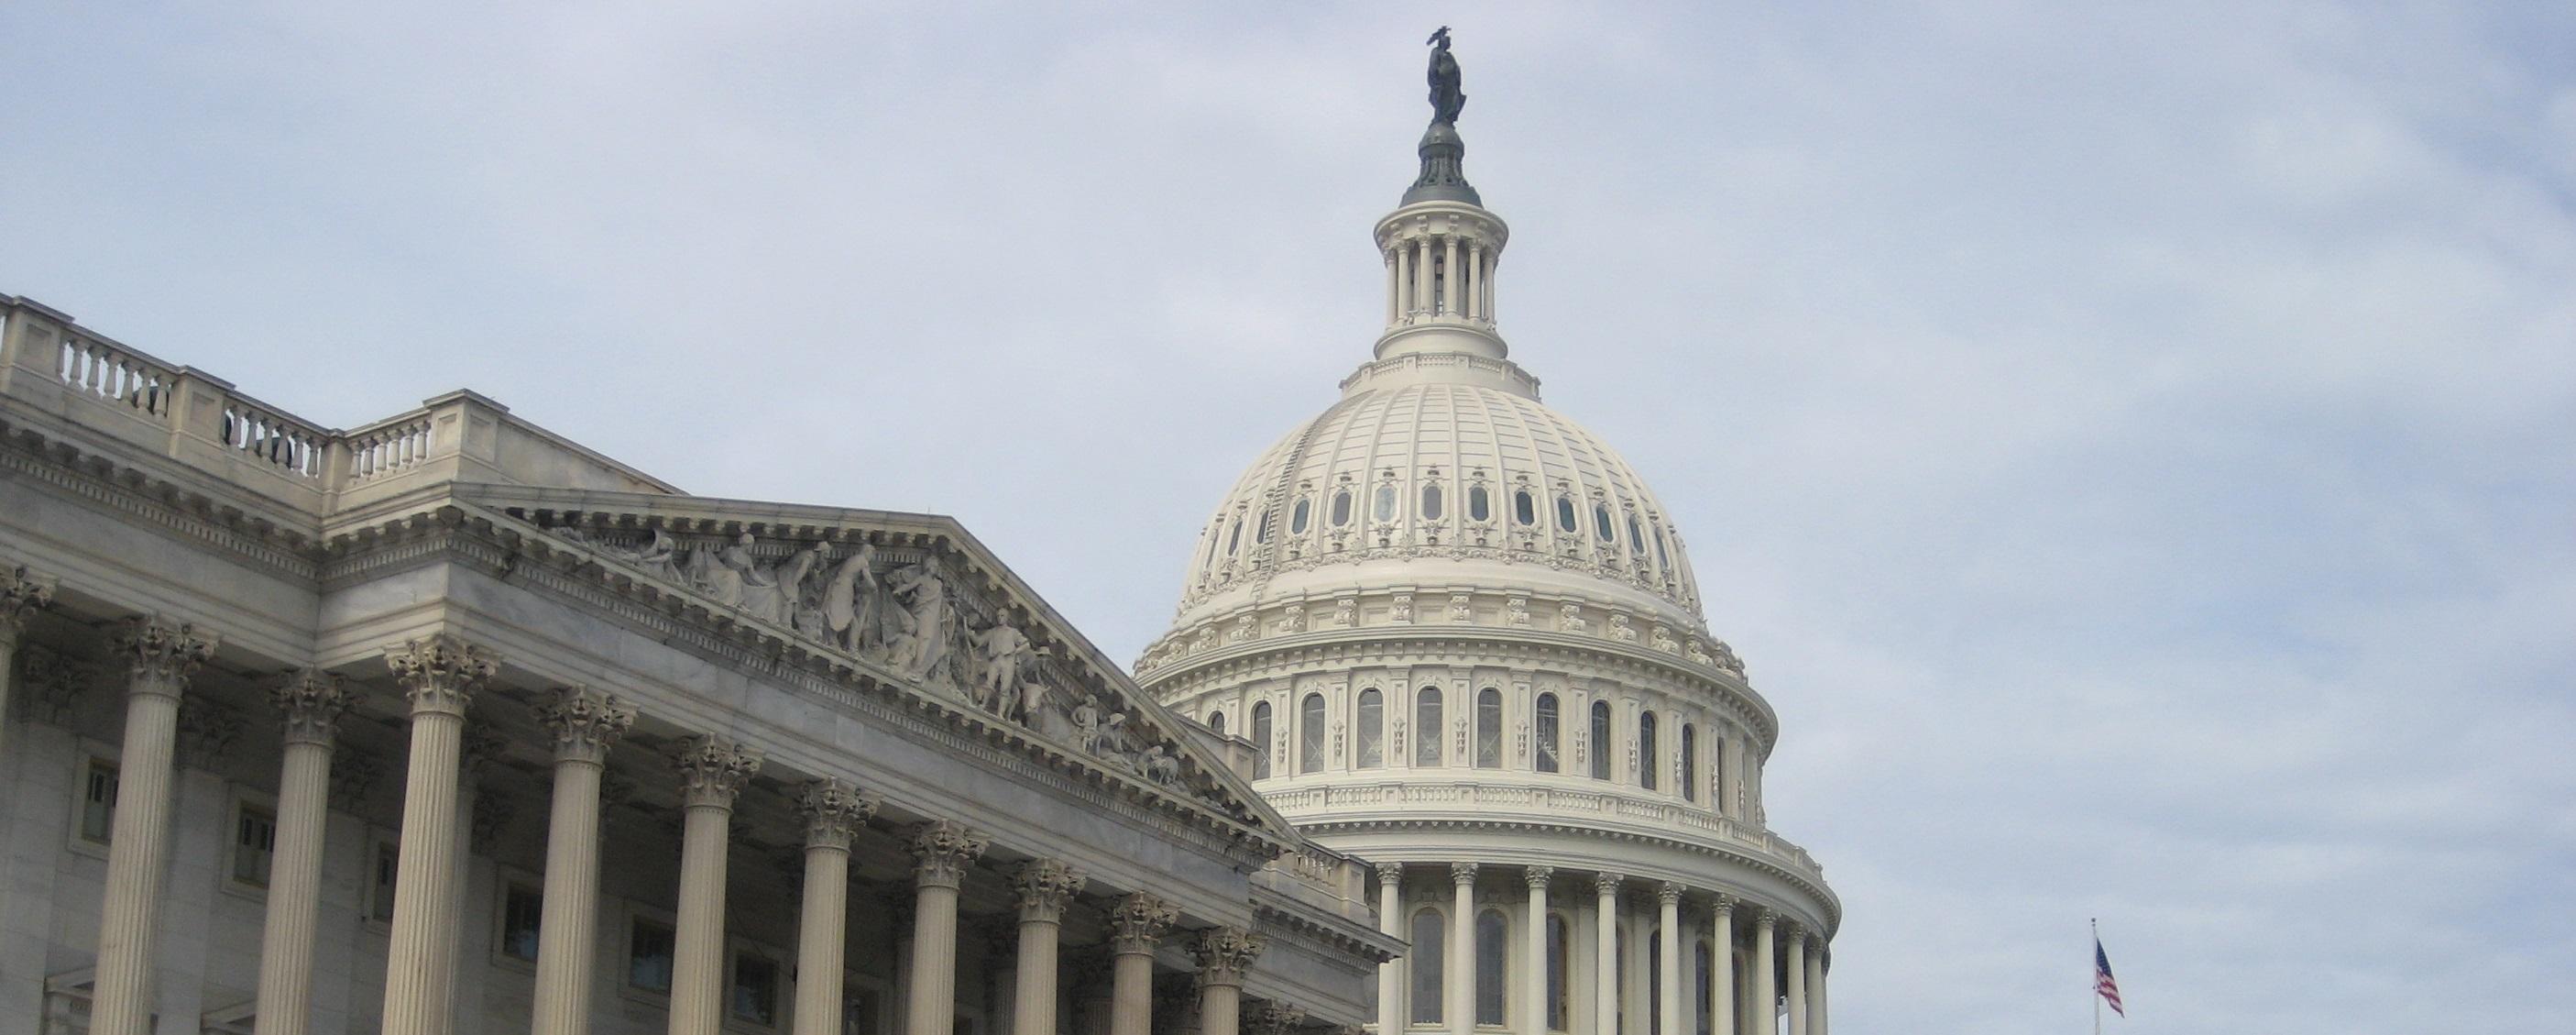 U.S. Capitol_Image Souce: AZBio